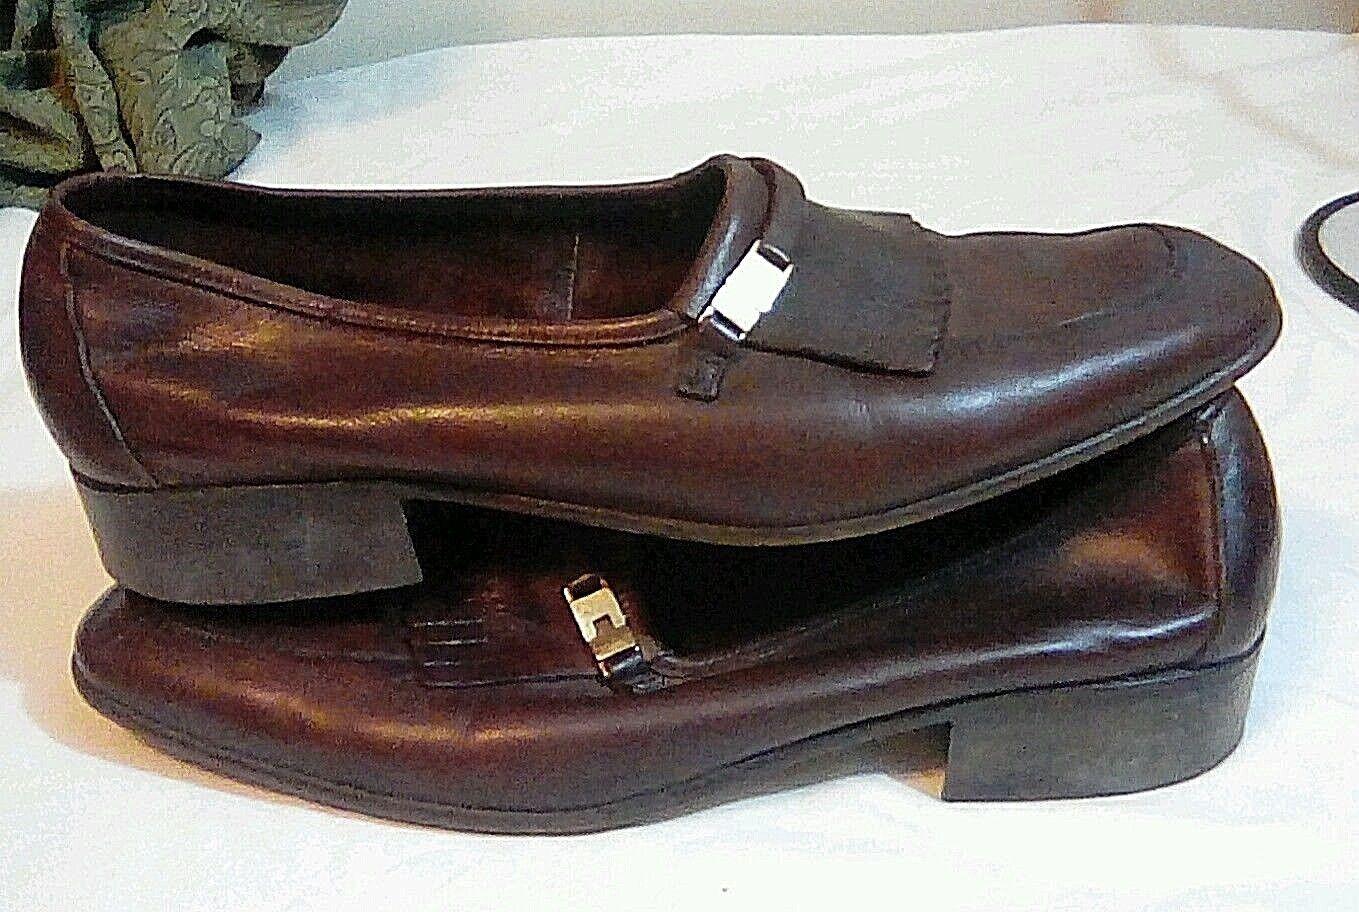 Bally of Switzerland Loafers Alengo braun Mens Supple Leather Loafers Switzerland 8 M Free Shipping 6fd647